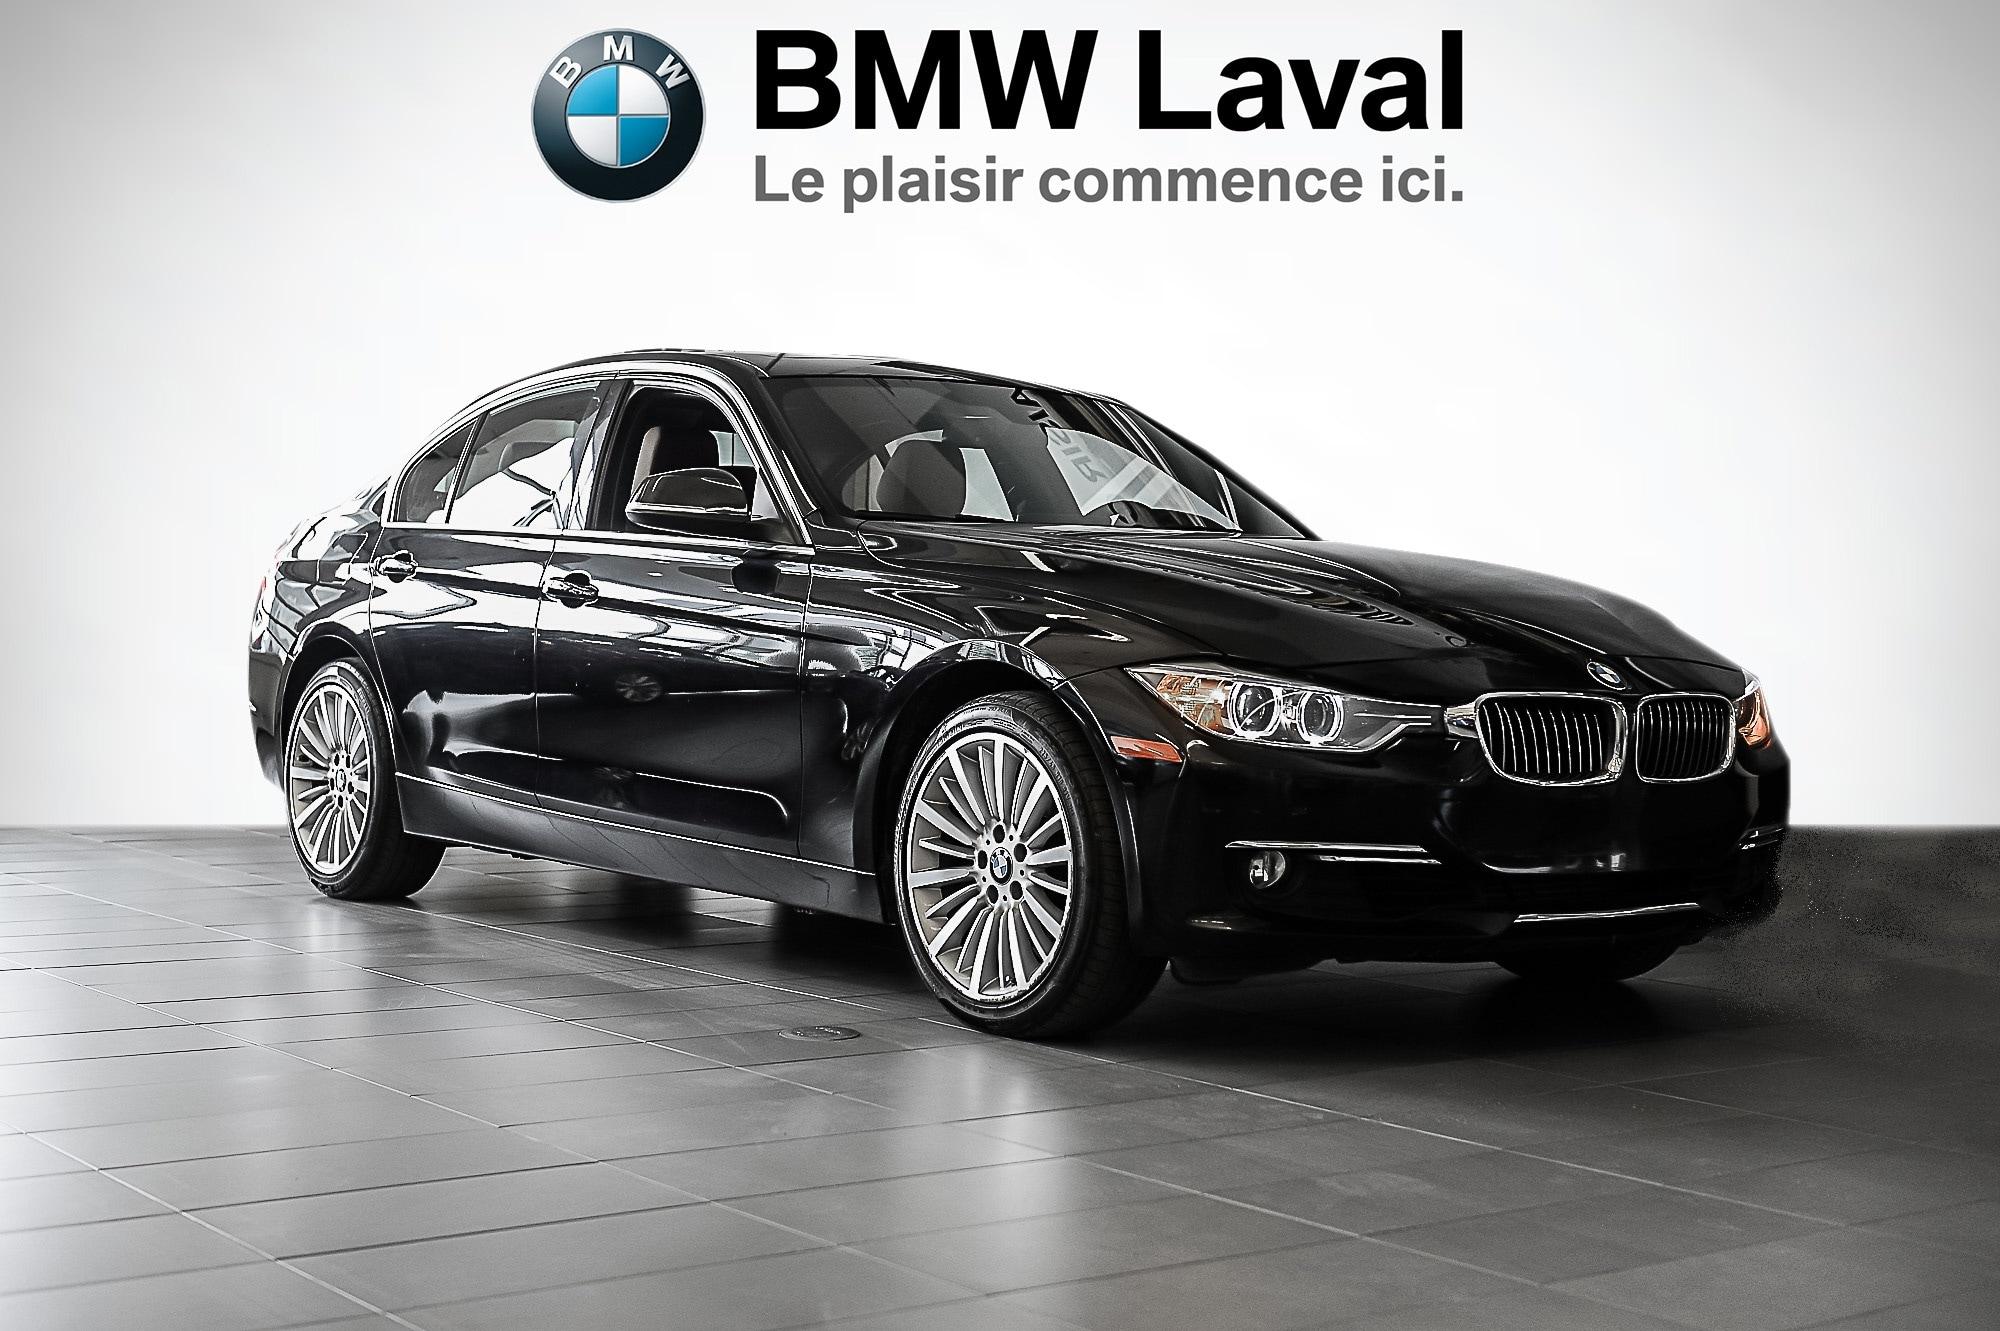 2015 BMW 3 Series 328i xDrive LIGNE DE LUXE Sedan